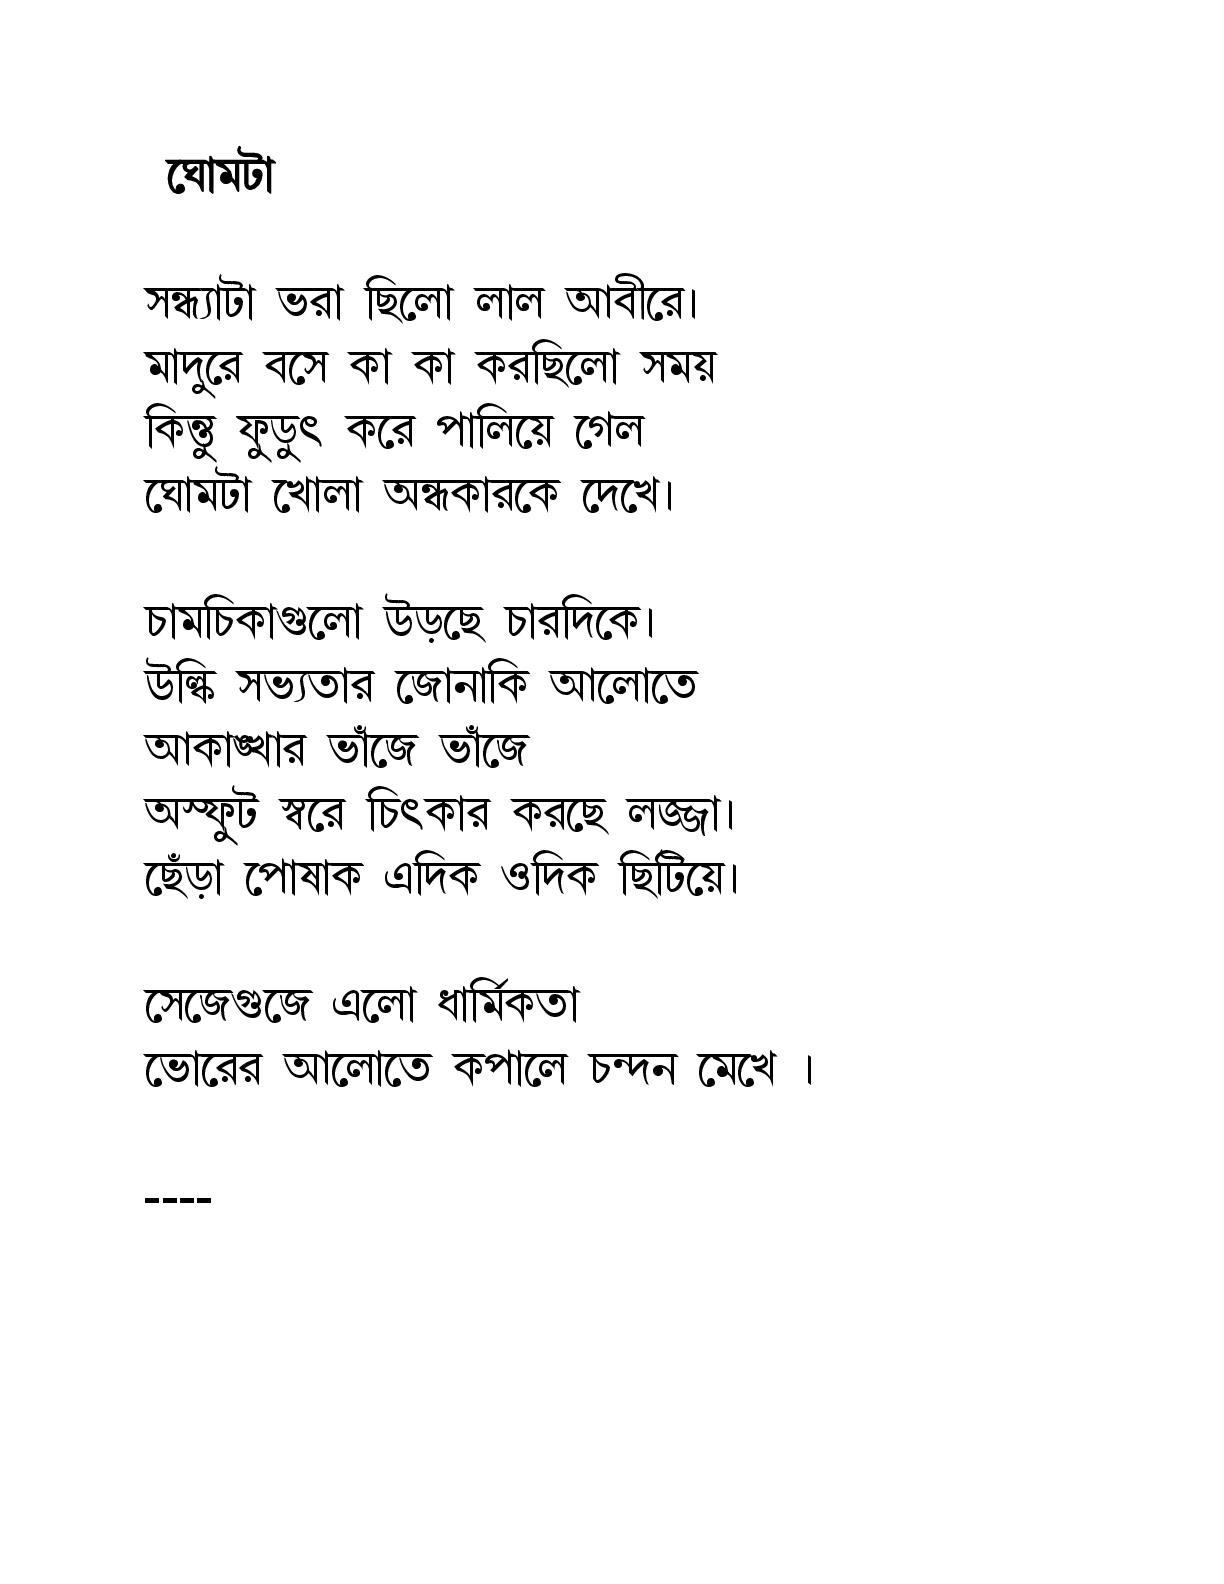 my blog ( MANOJ KRISHNA SANYAL): One Bengali Language Poem